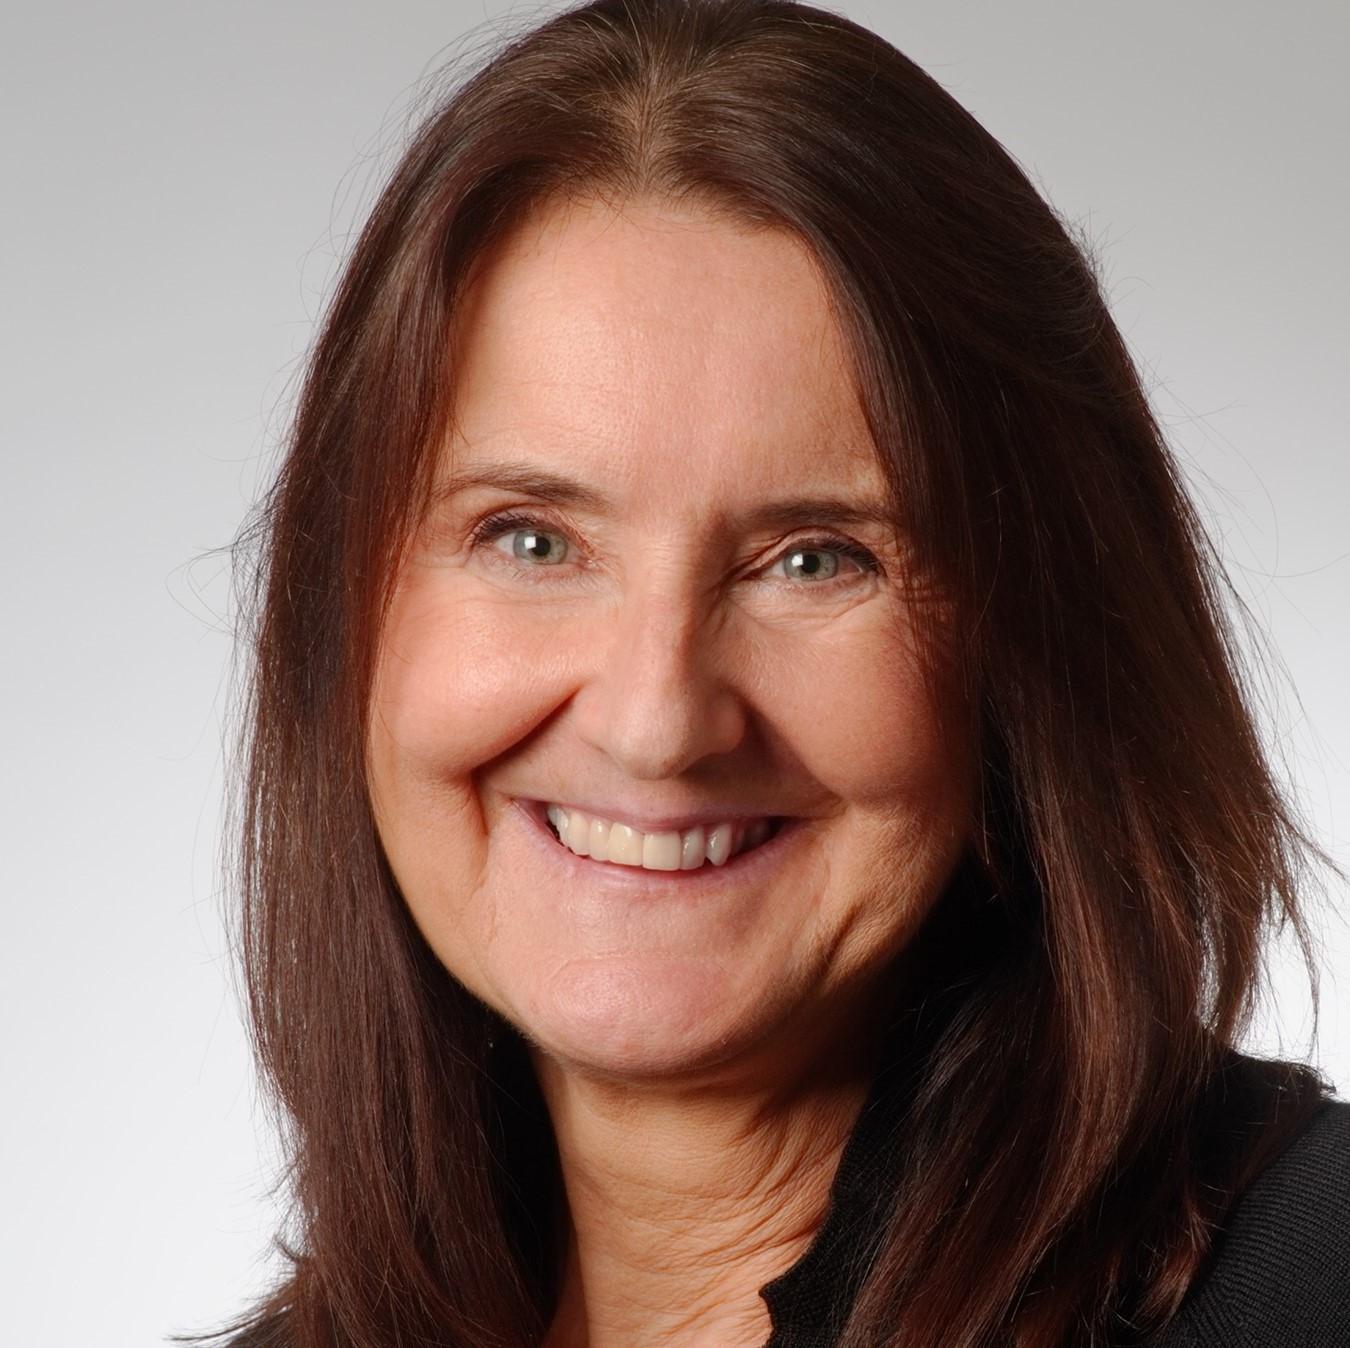 avatar for Birgit Schunck